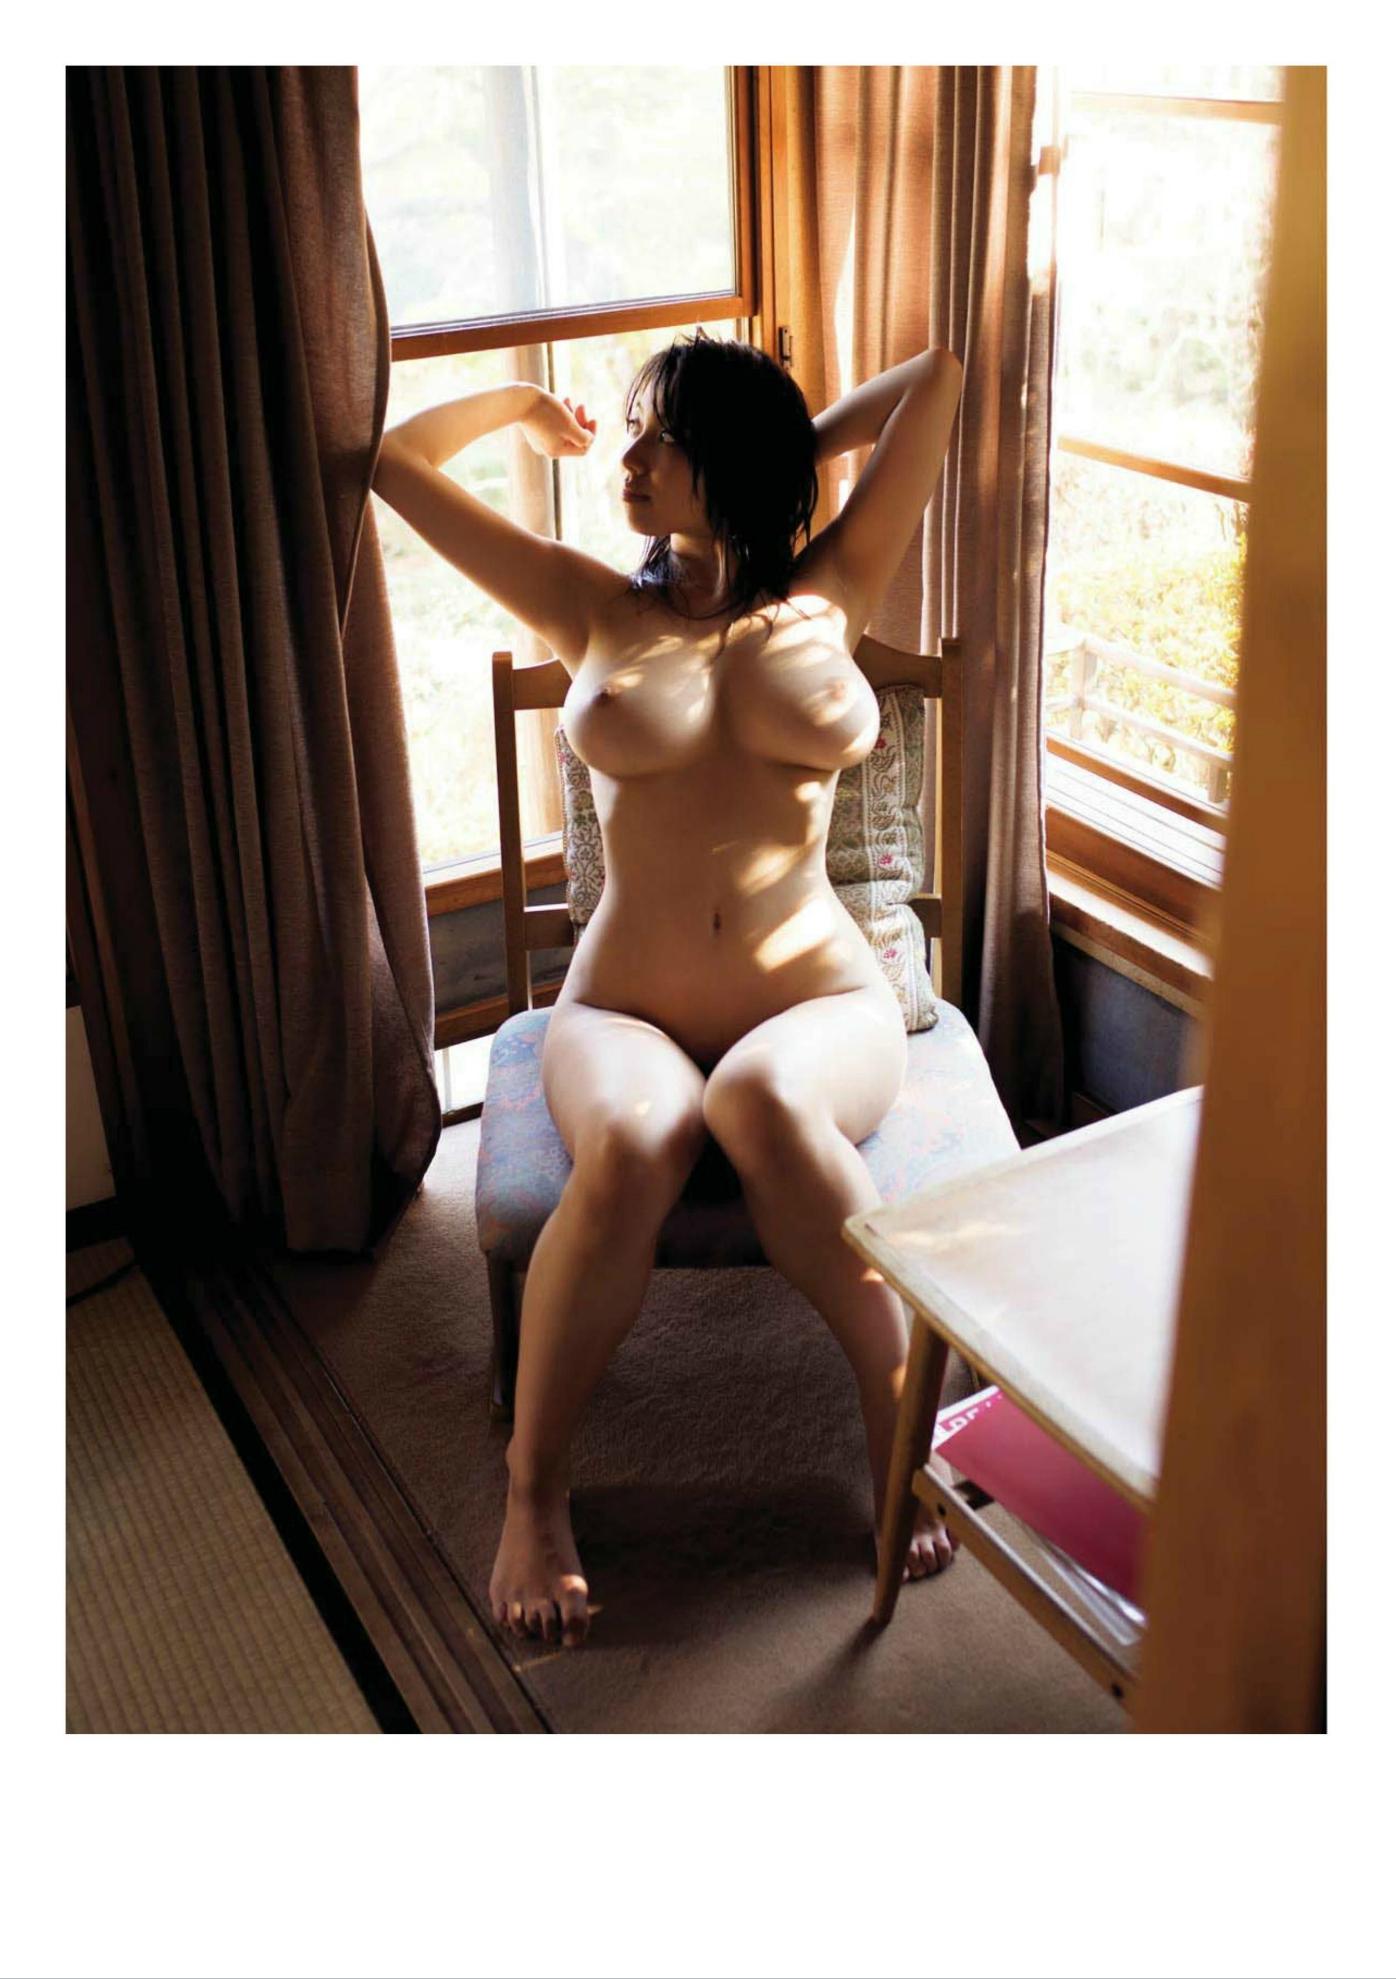 image http://scanlover.com/assets/images/2952-WNEklofs6WLY103F.jpeg